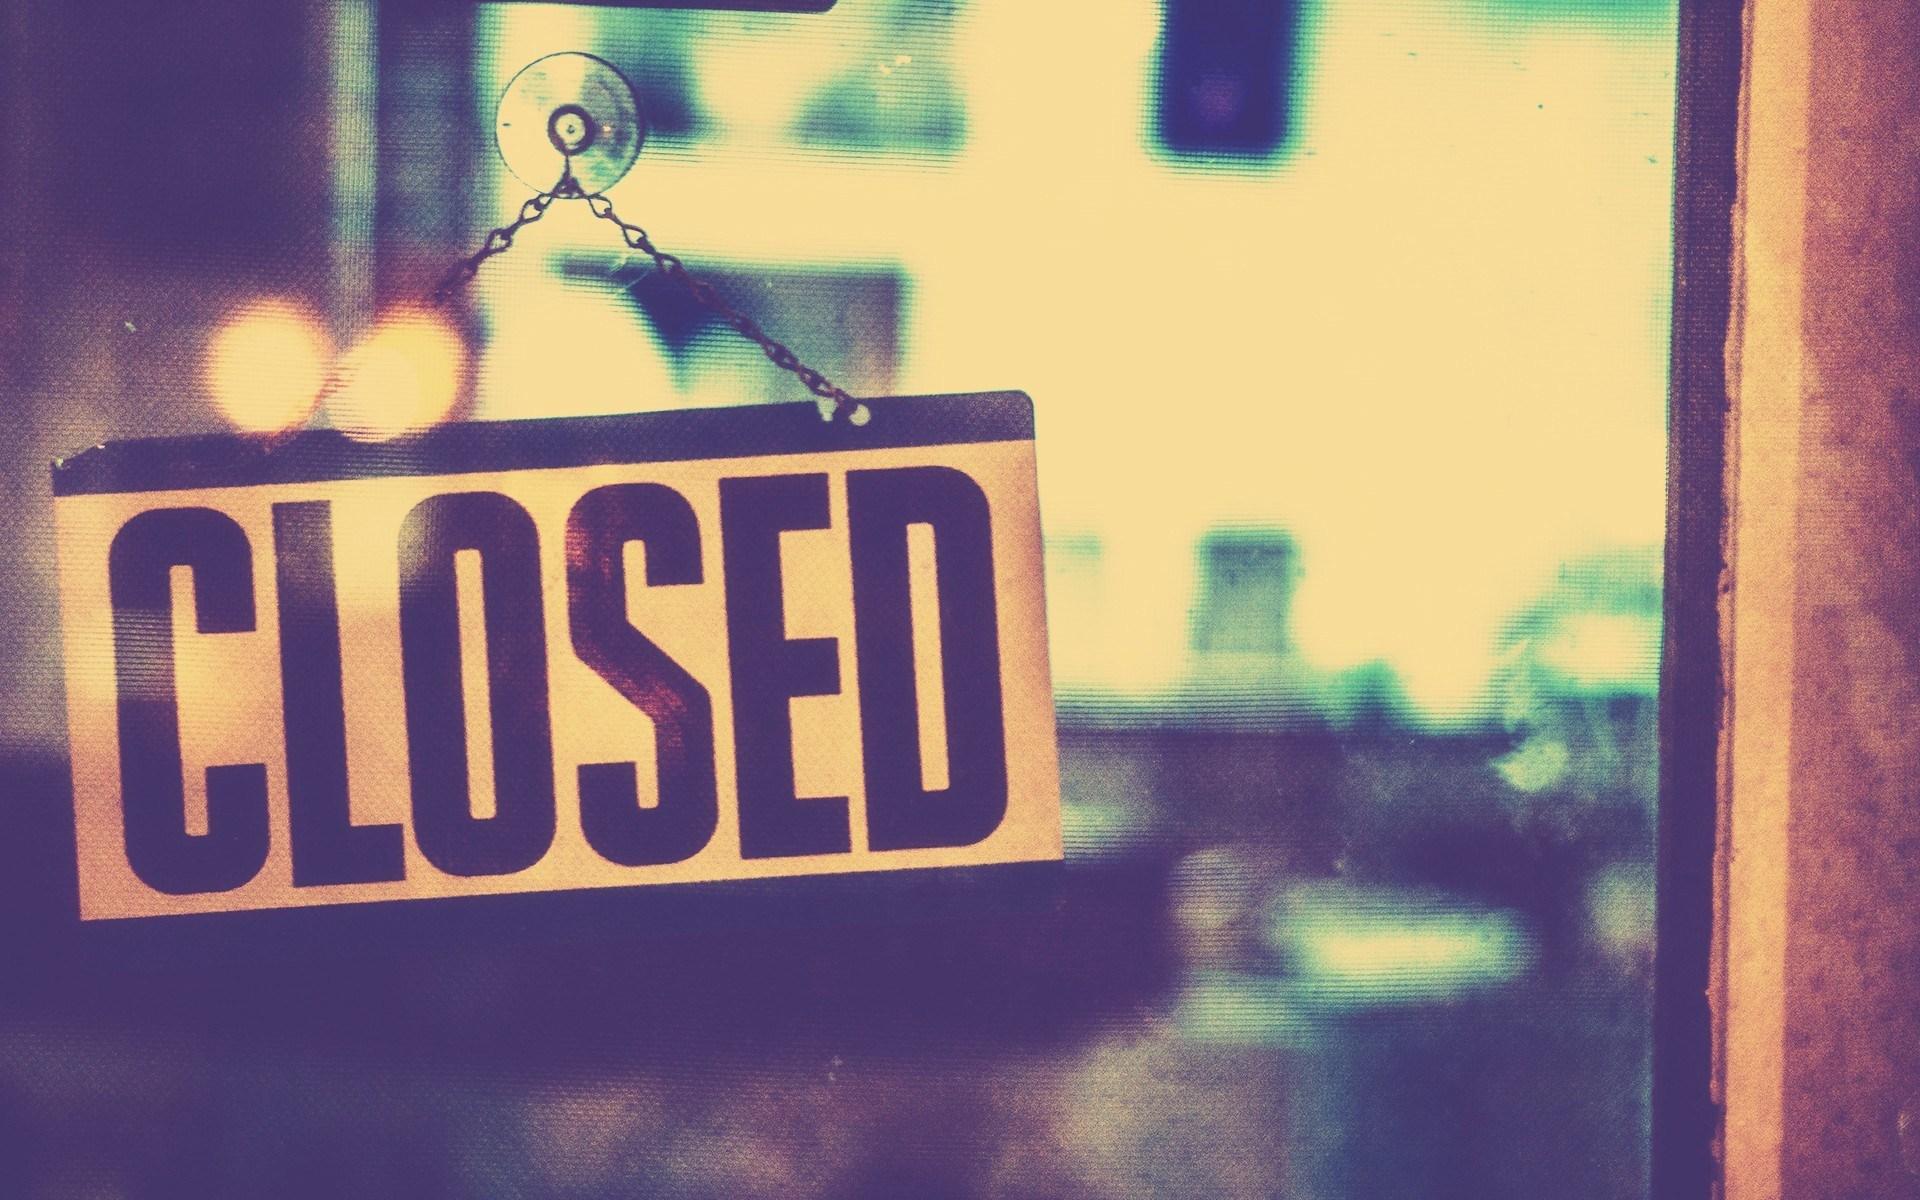 closed-sign-hd-wallpaper